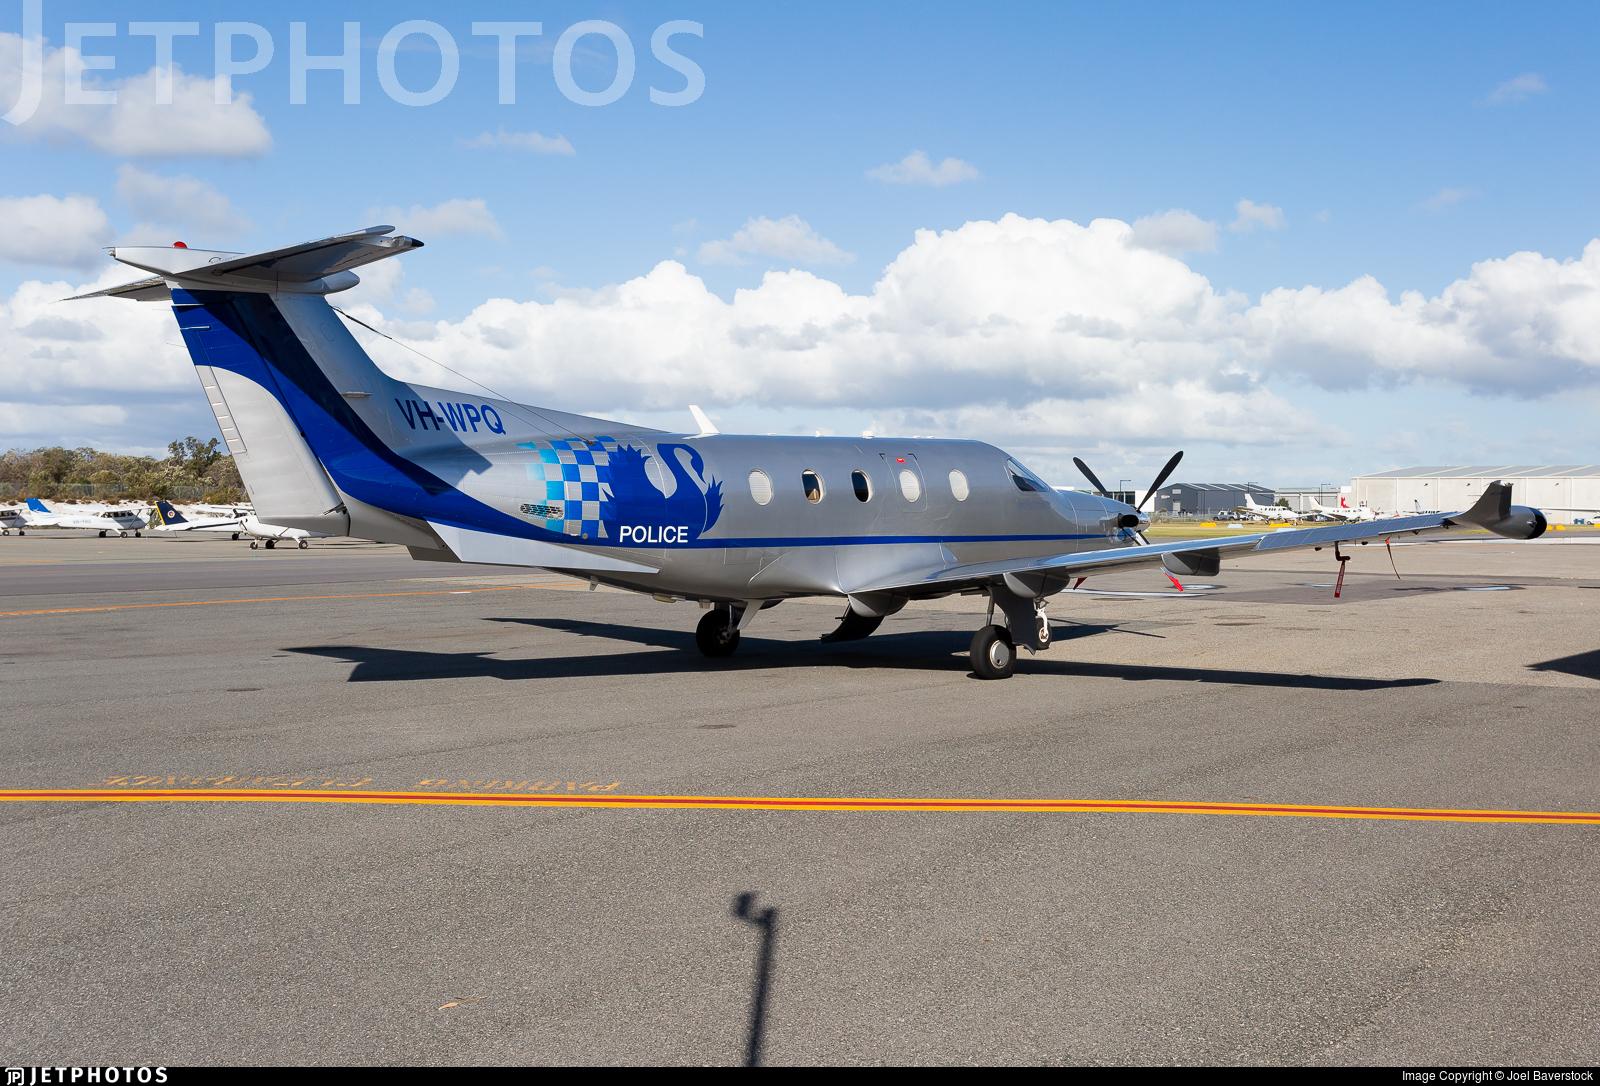 VH-WPQ - Pilatus PC-12/47E - Australia - Western Australia Police